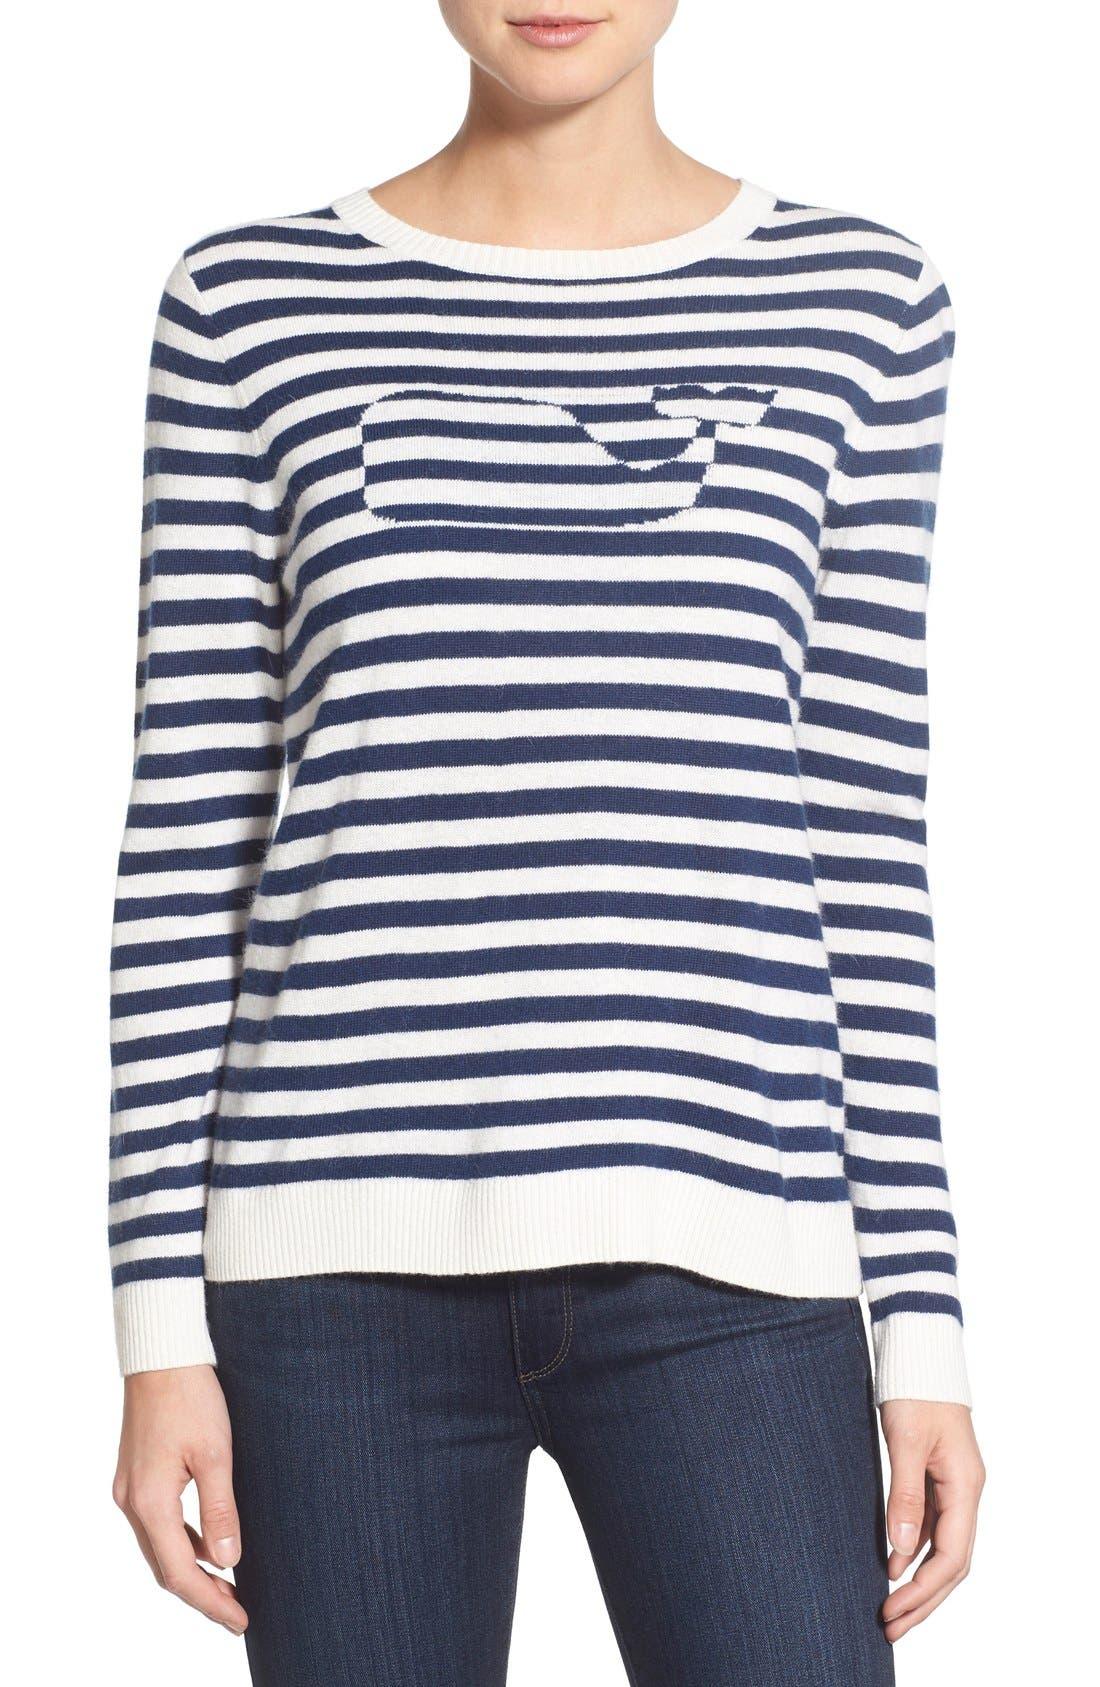 Alternate Image 1 Selected - Vineyard Vines 'Nautical Stripe Whale' Crewneck Sweater